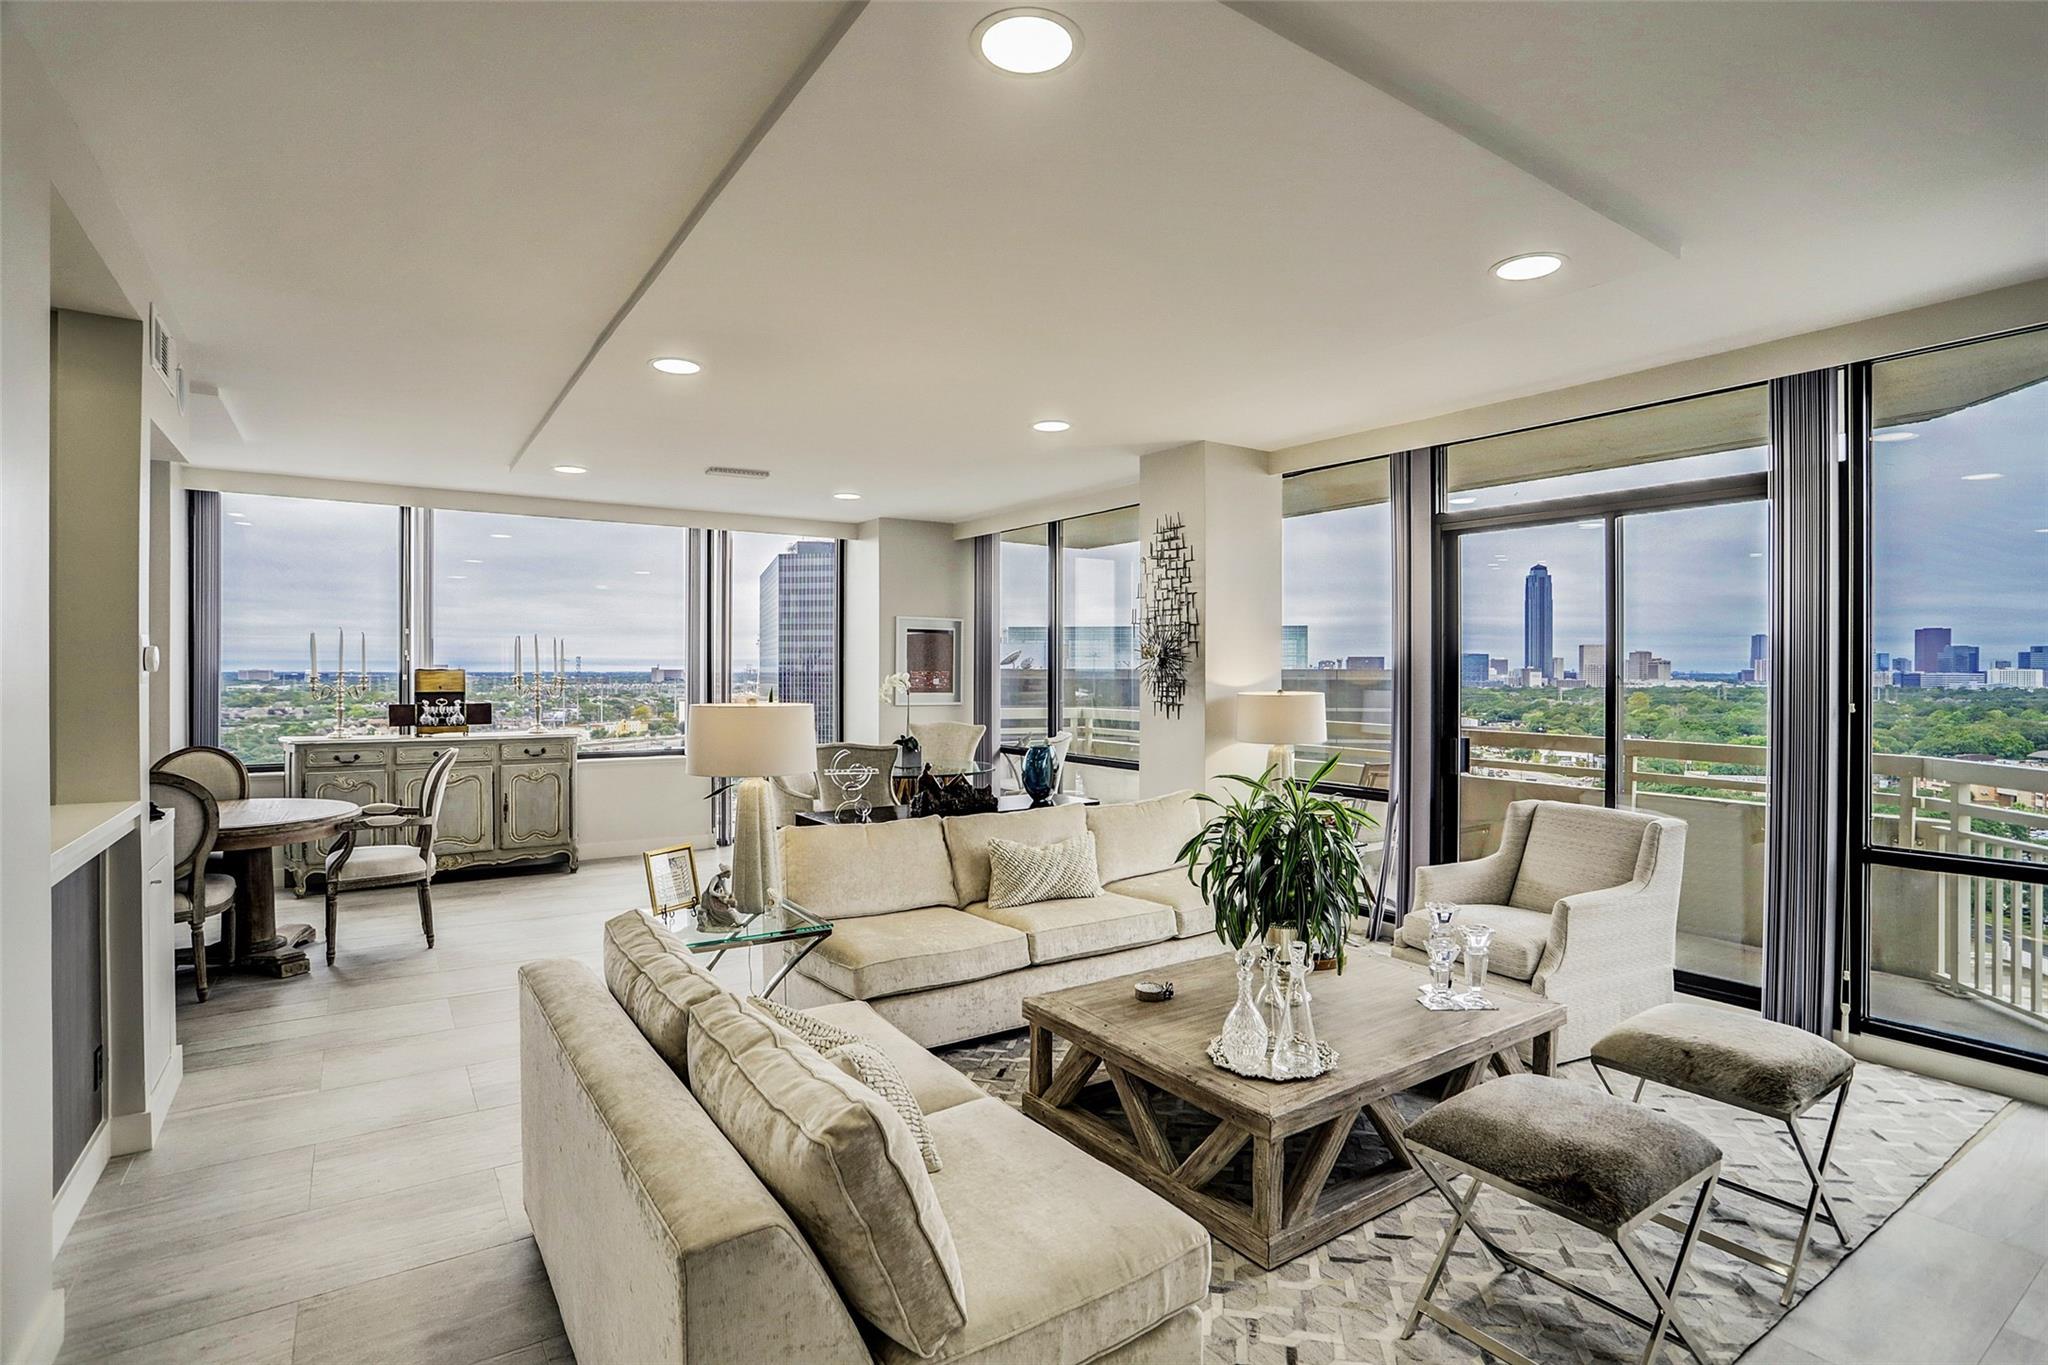 14 Greenway Plaza #15Q Property Photo - Houston, TX real estate listing